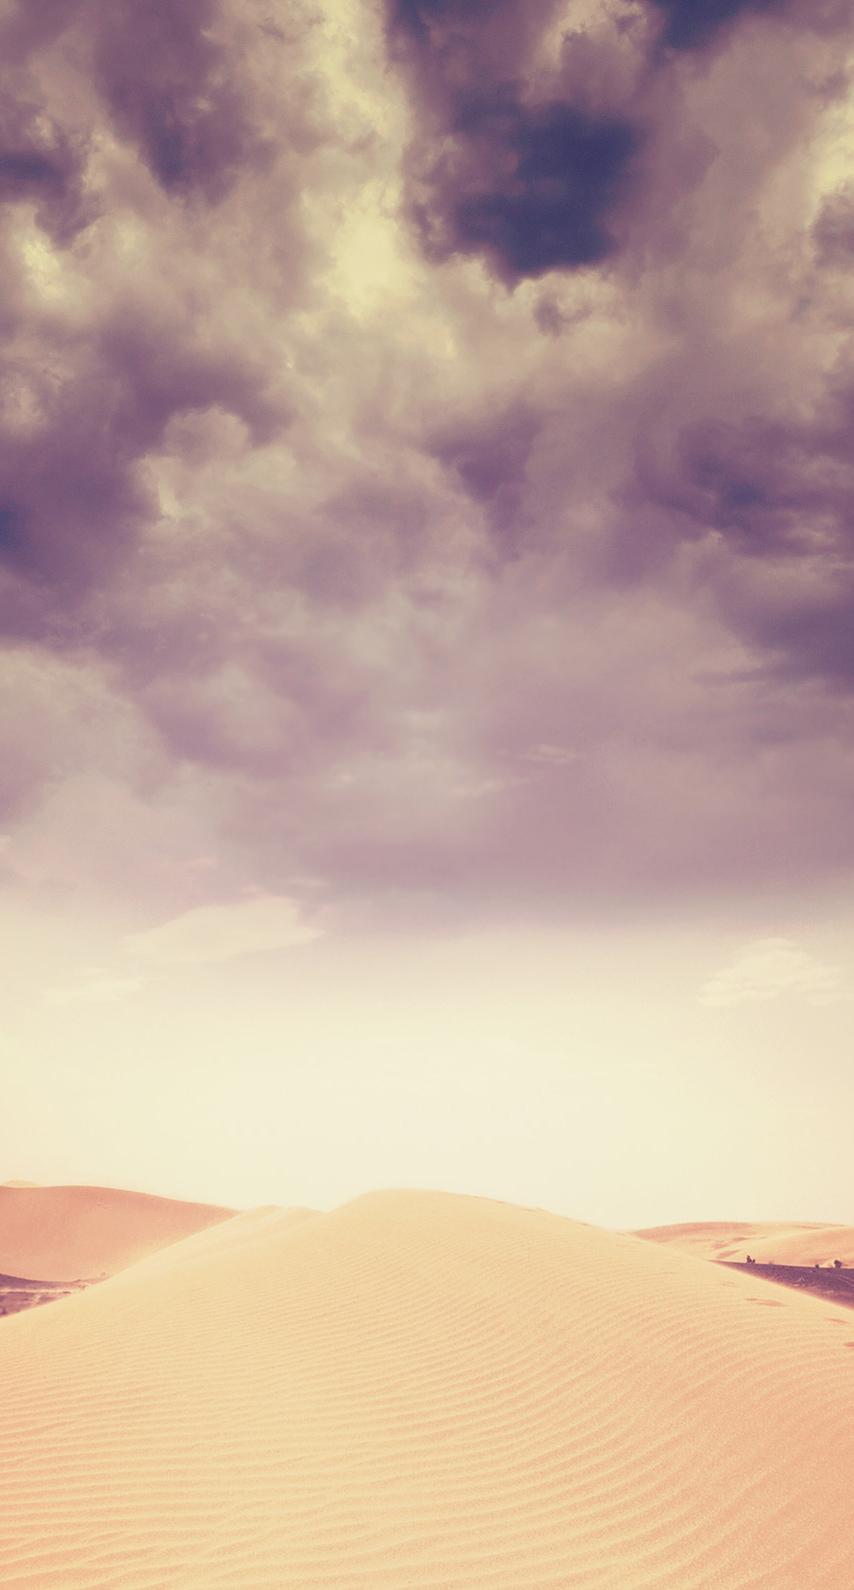 evening, sun, hot, no person, dawn, cloud, outdoors, dune, hill, wasteland